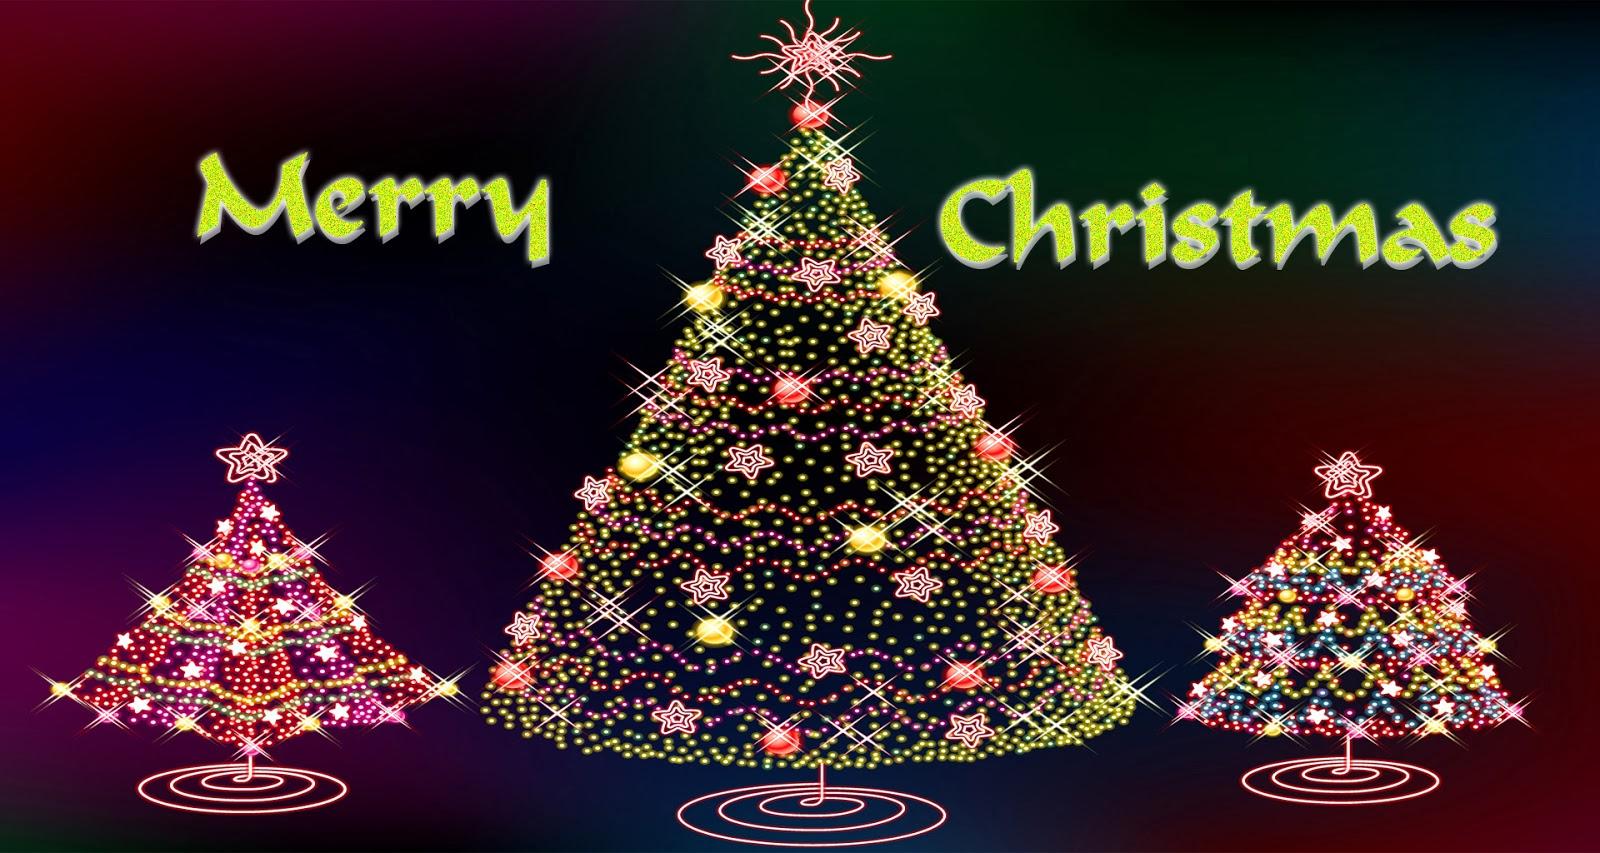 Merry Christmas Wallpaper | HD Wallpaper 1080p